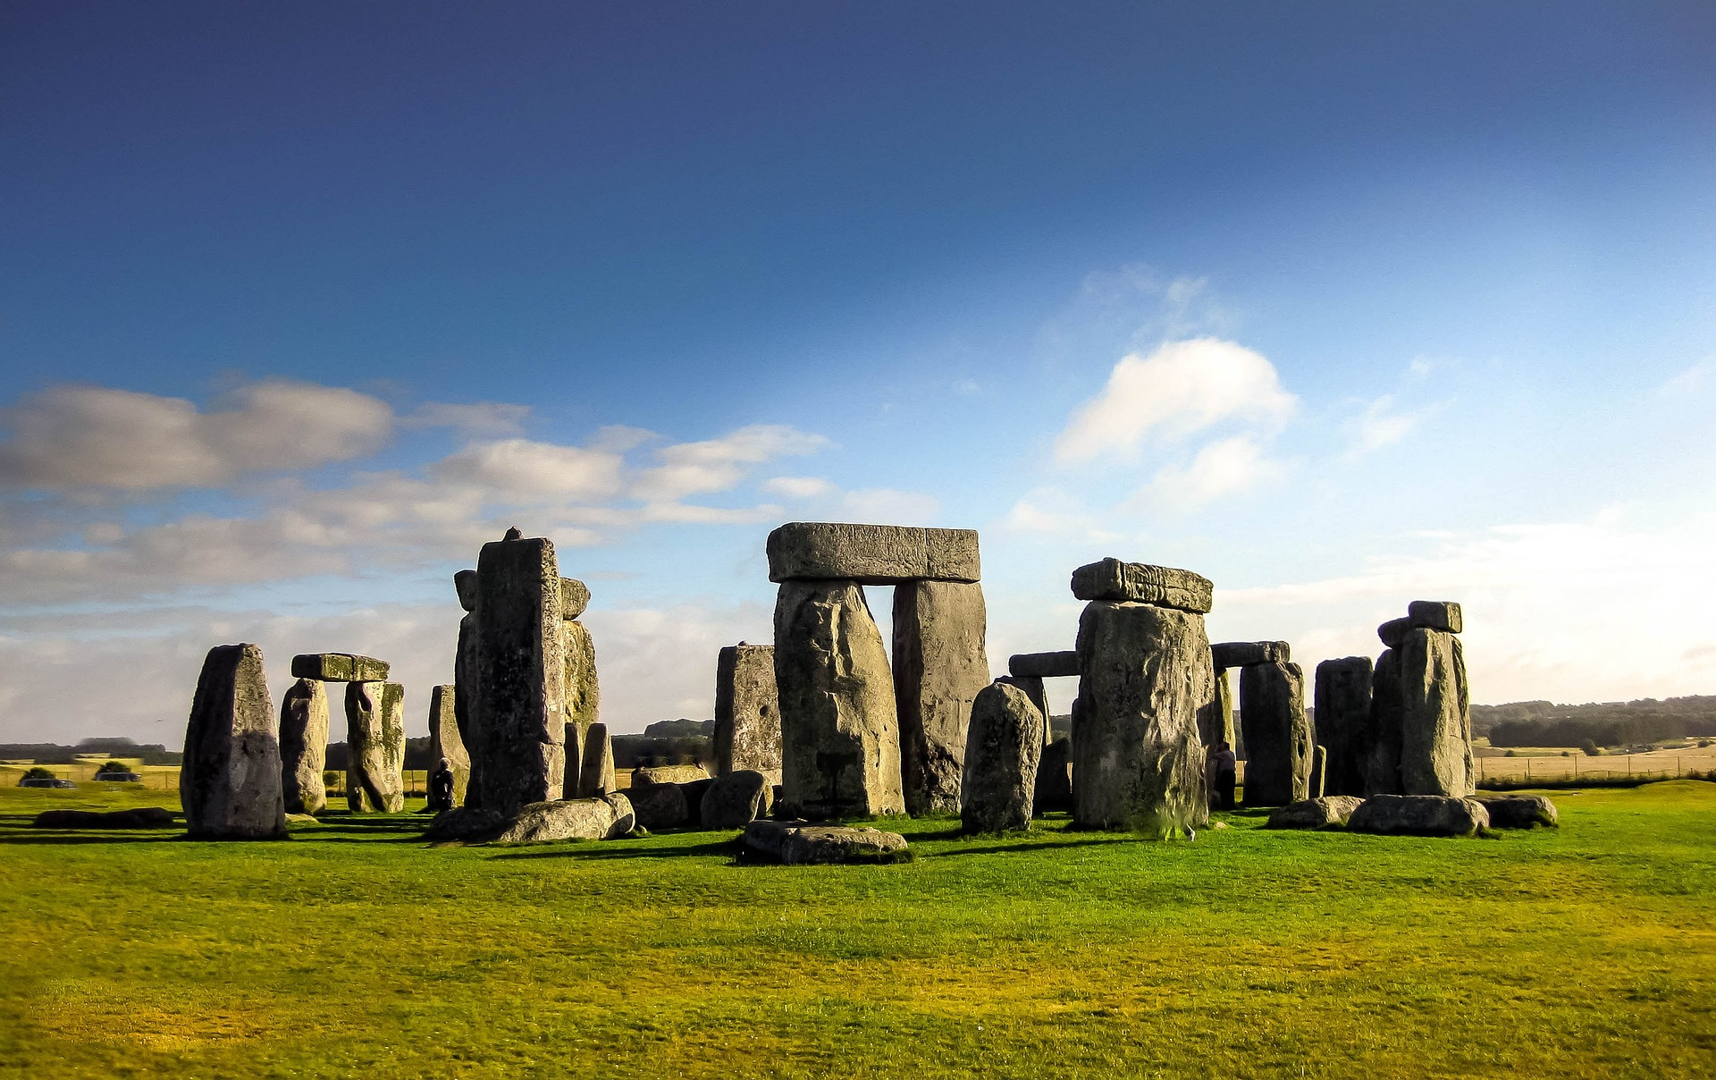 The History Of The Iconic Stonehenge